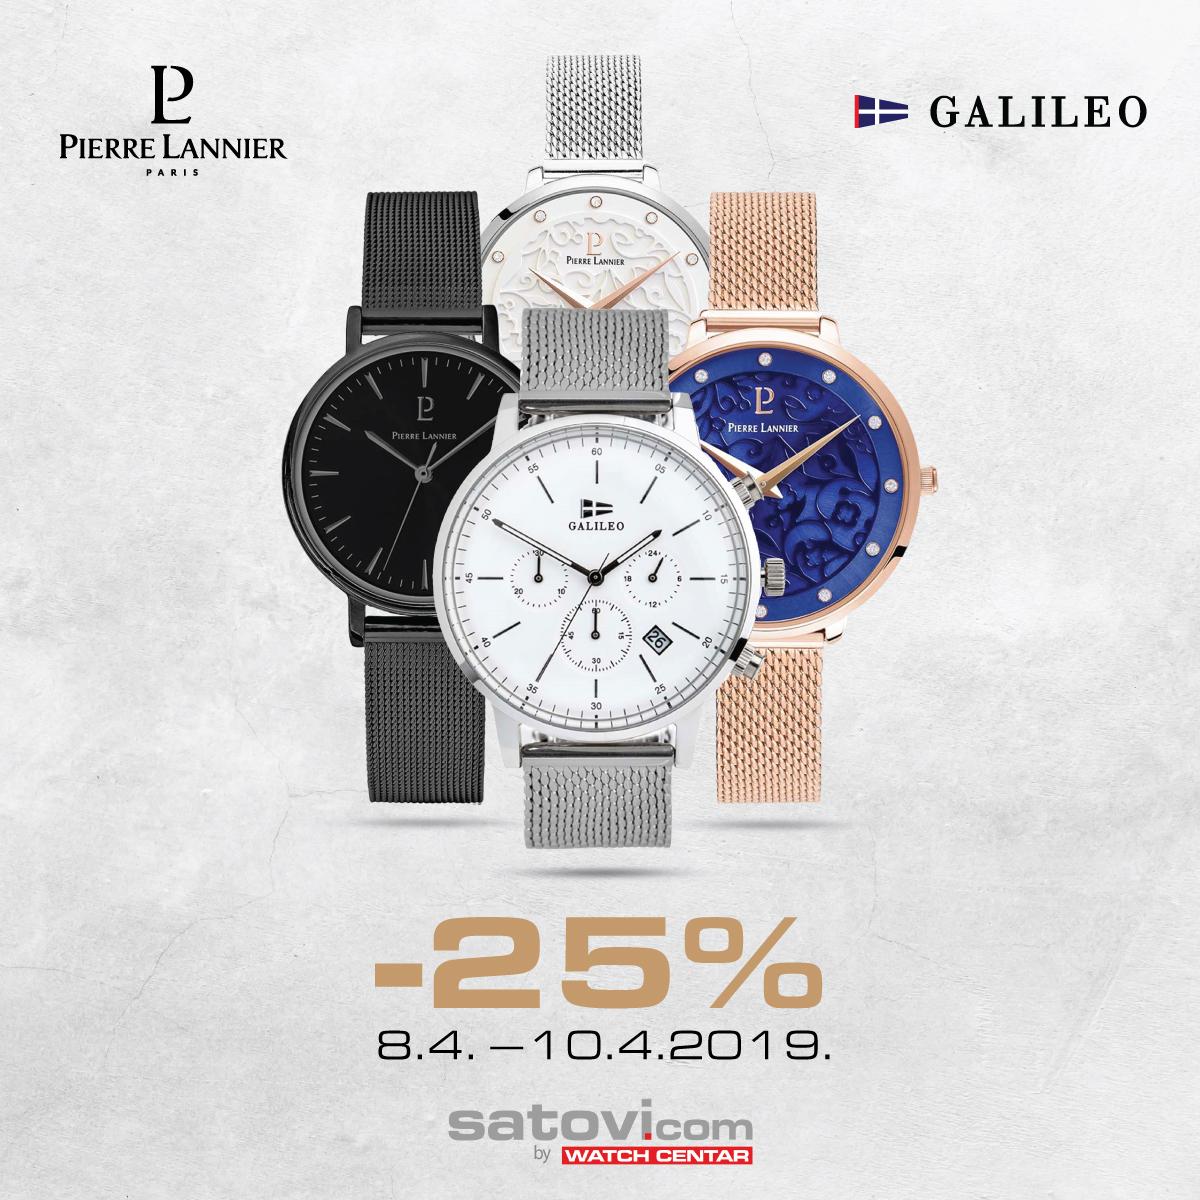 FB_02_8.-10.4.-Pierre-Lannier-i-Galileo-satovi–25%